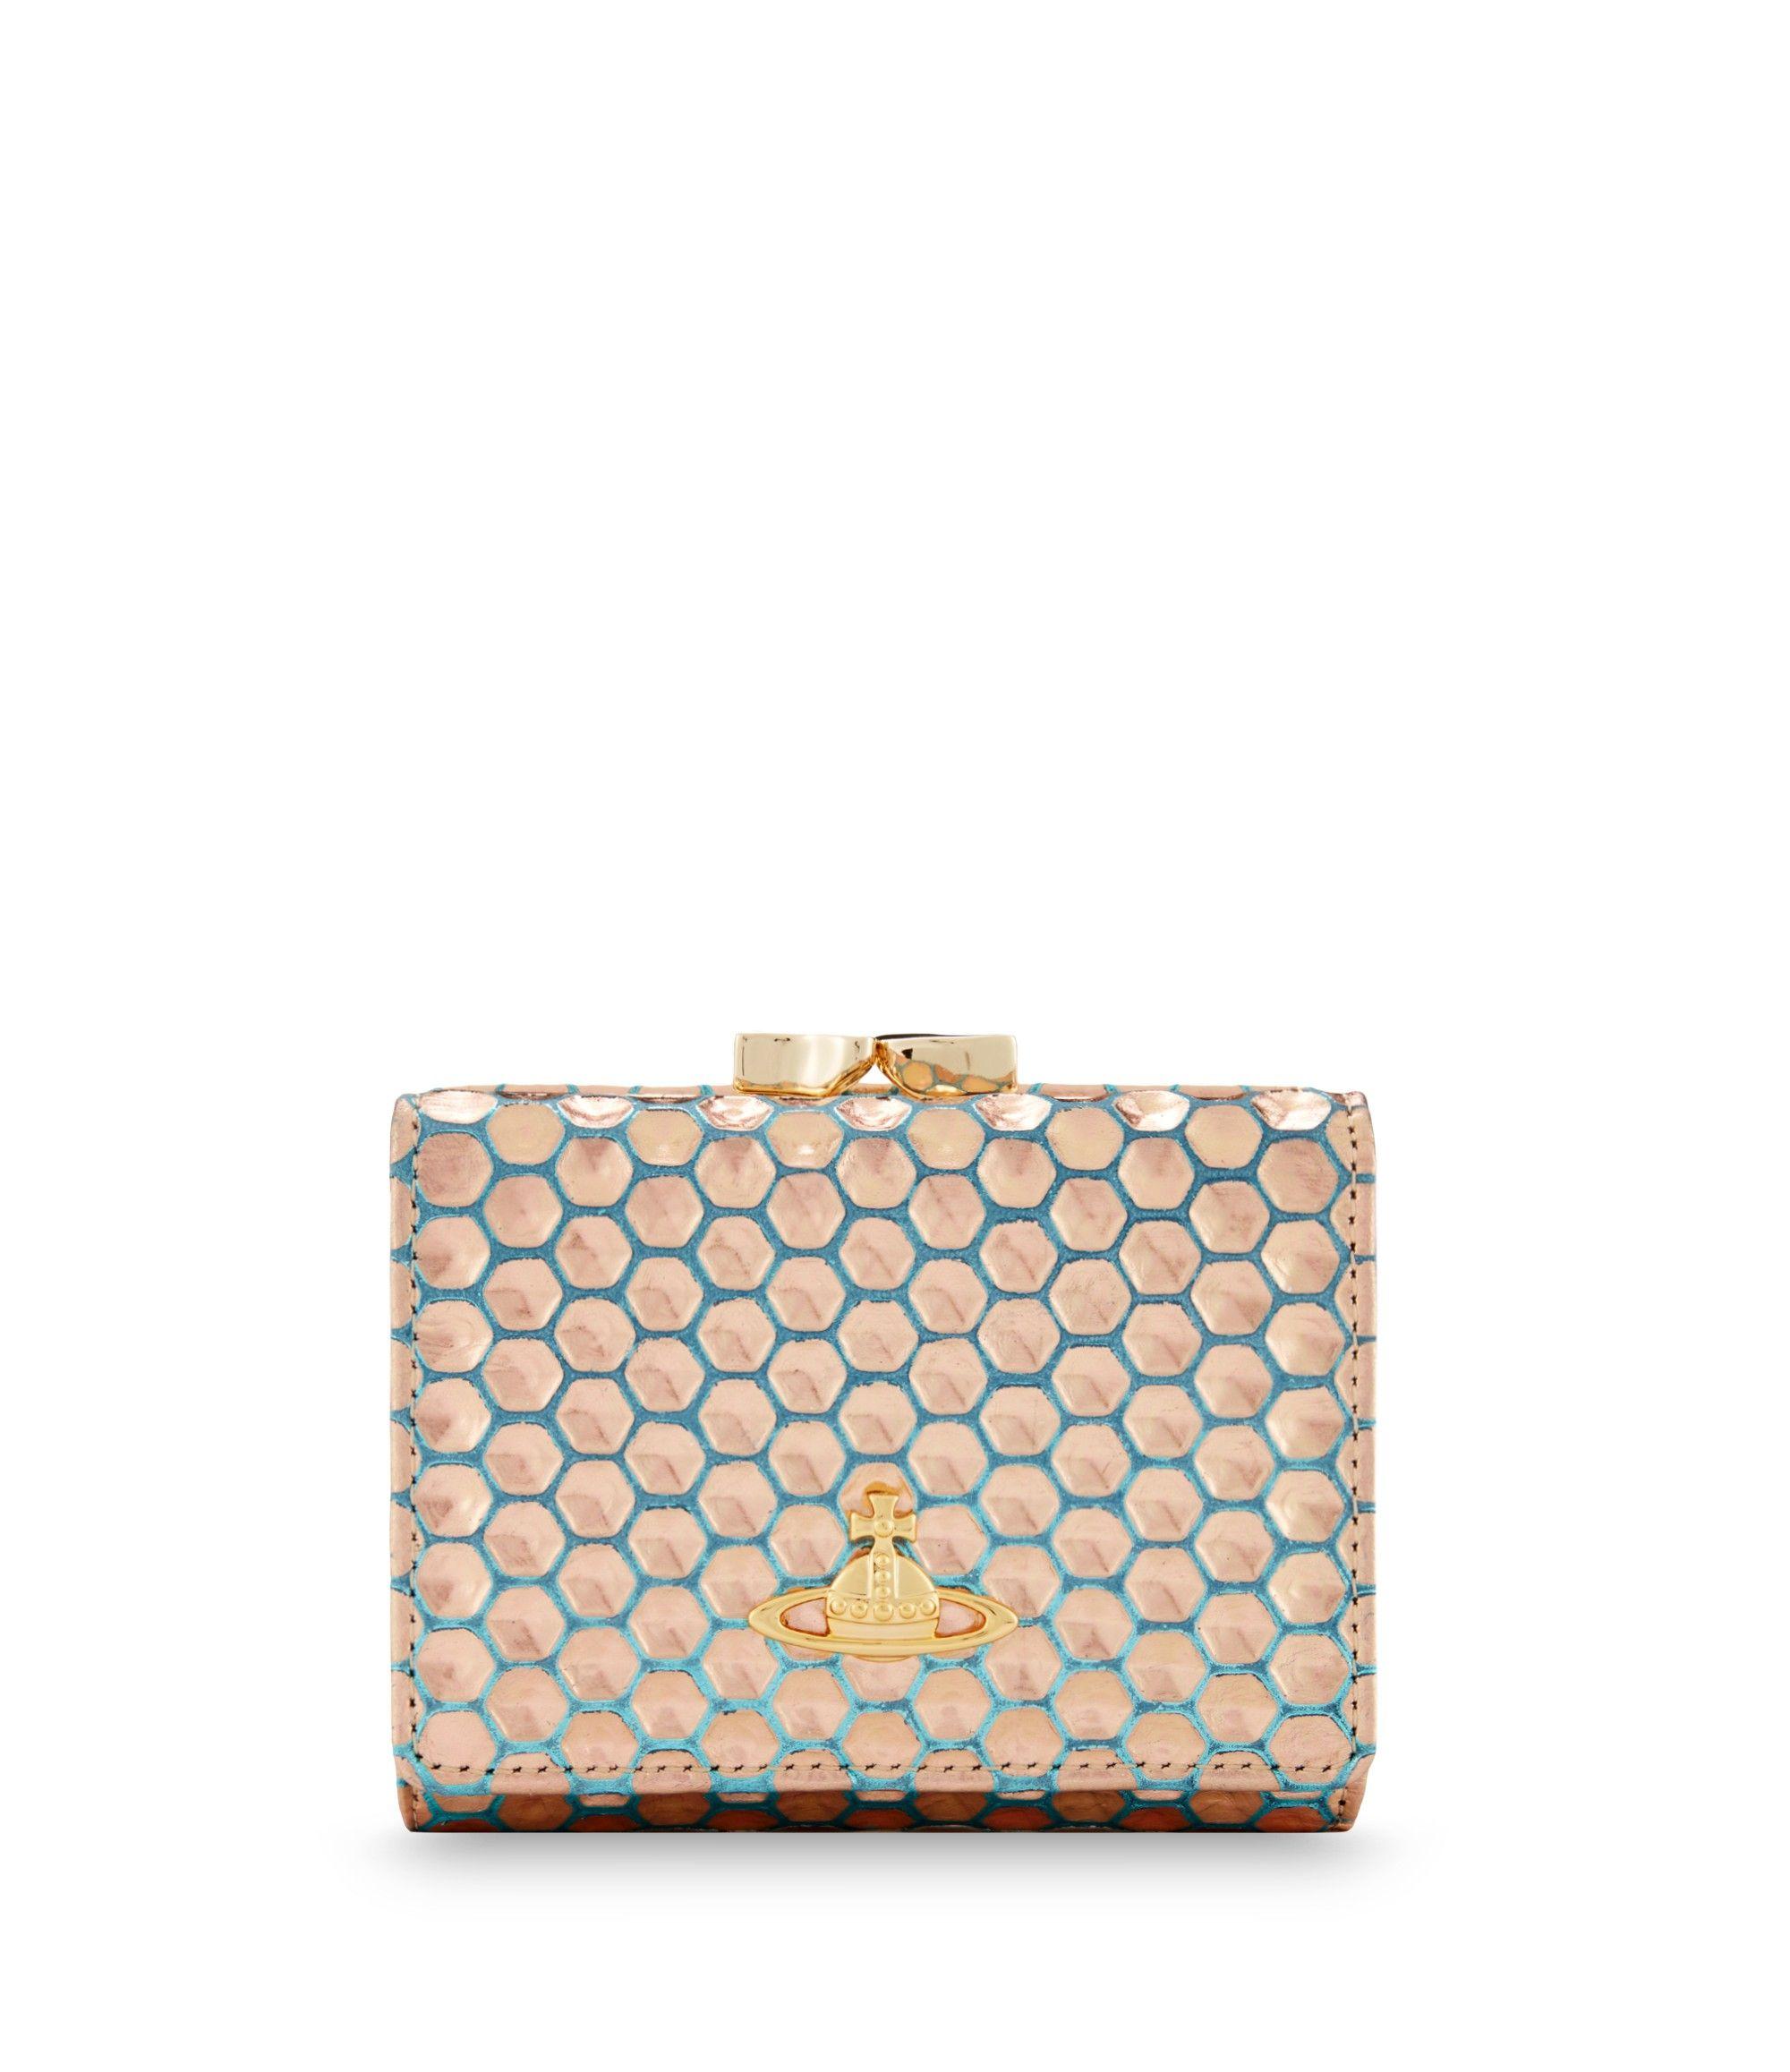 817c5fad70 Vivienne Westwood | Honey Comb Purse | unusual wallets and key ...